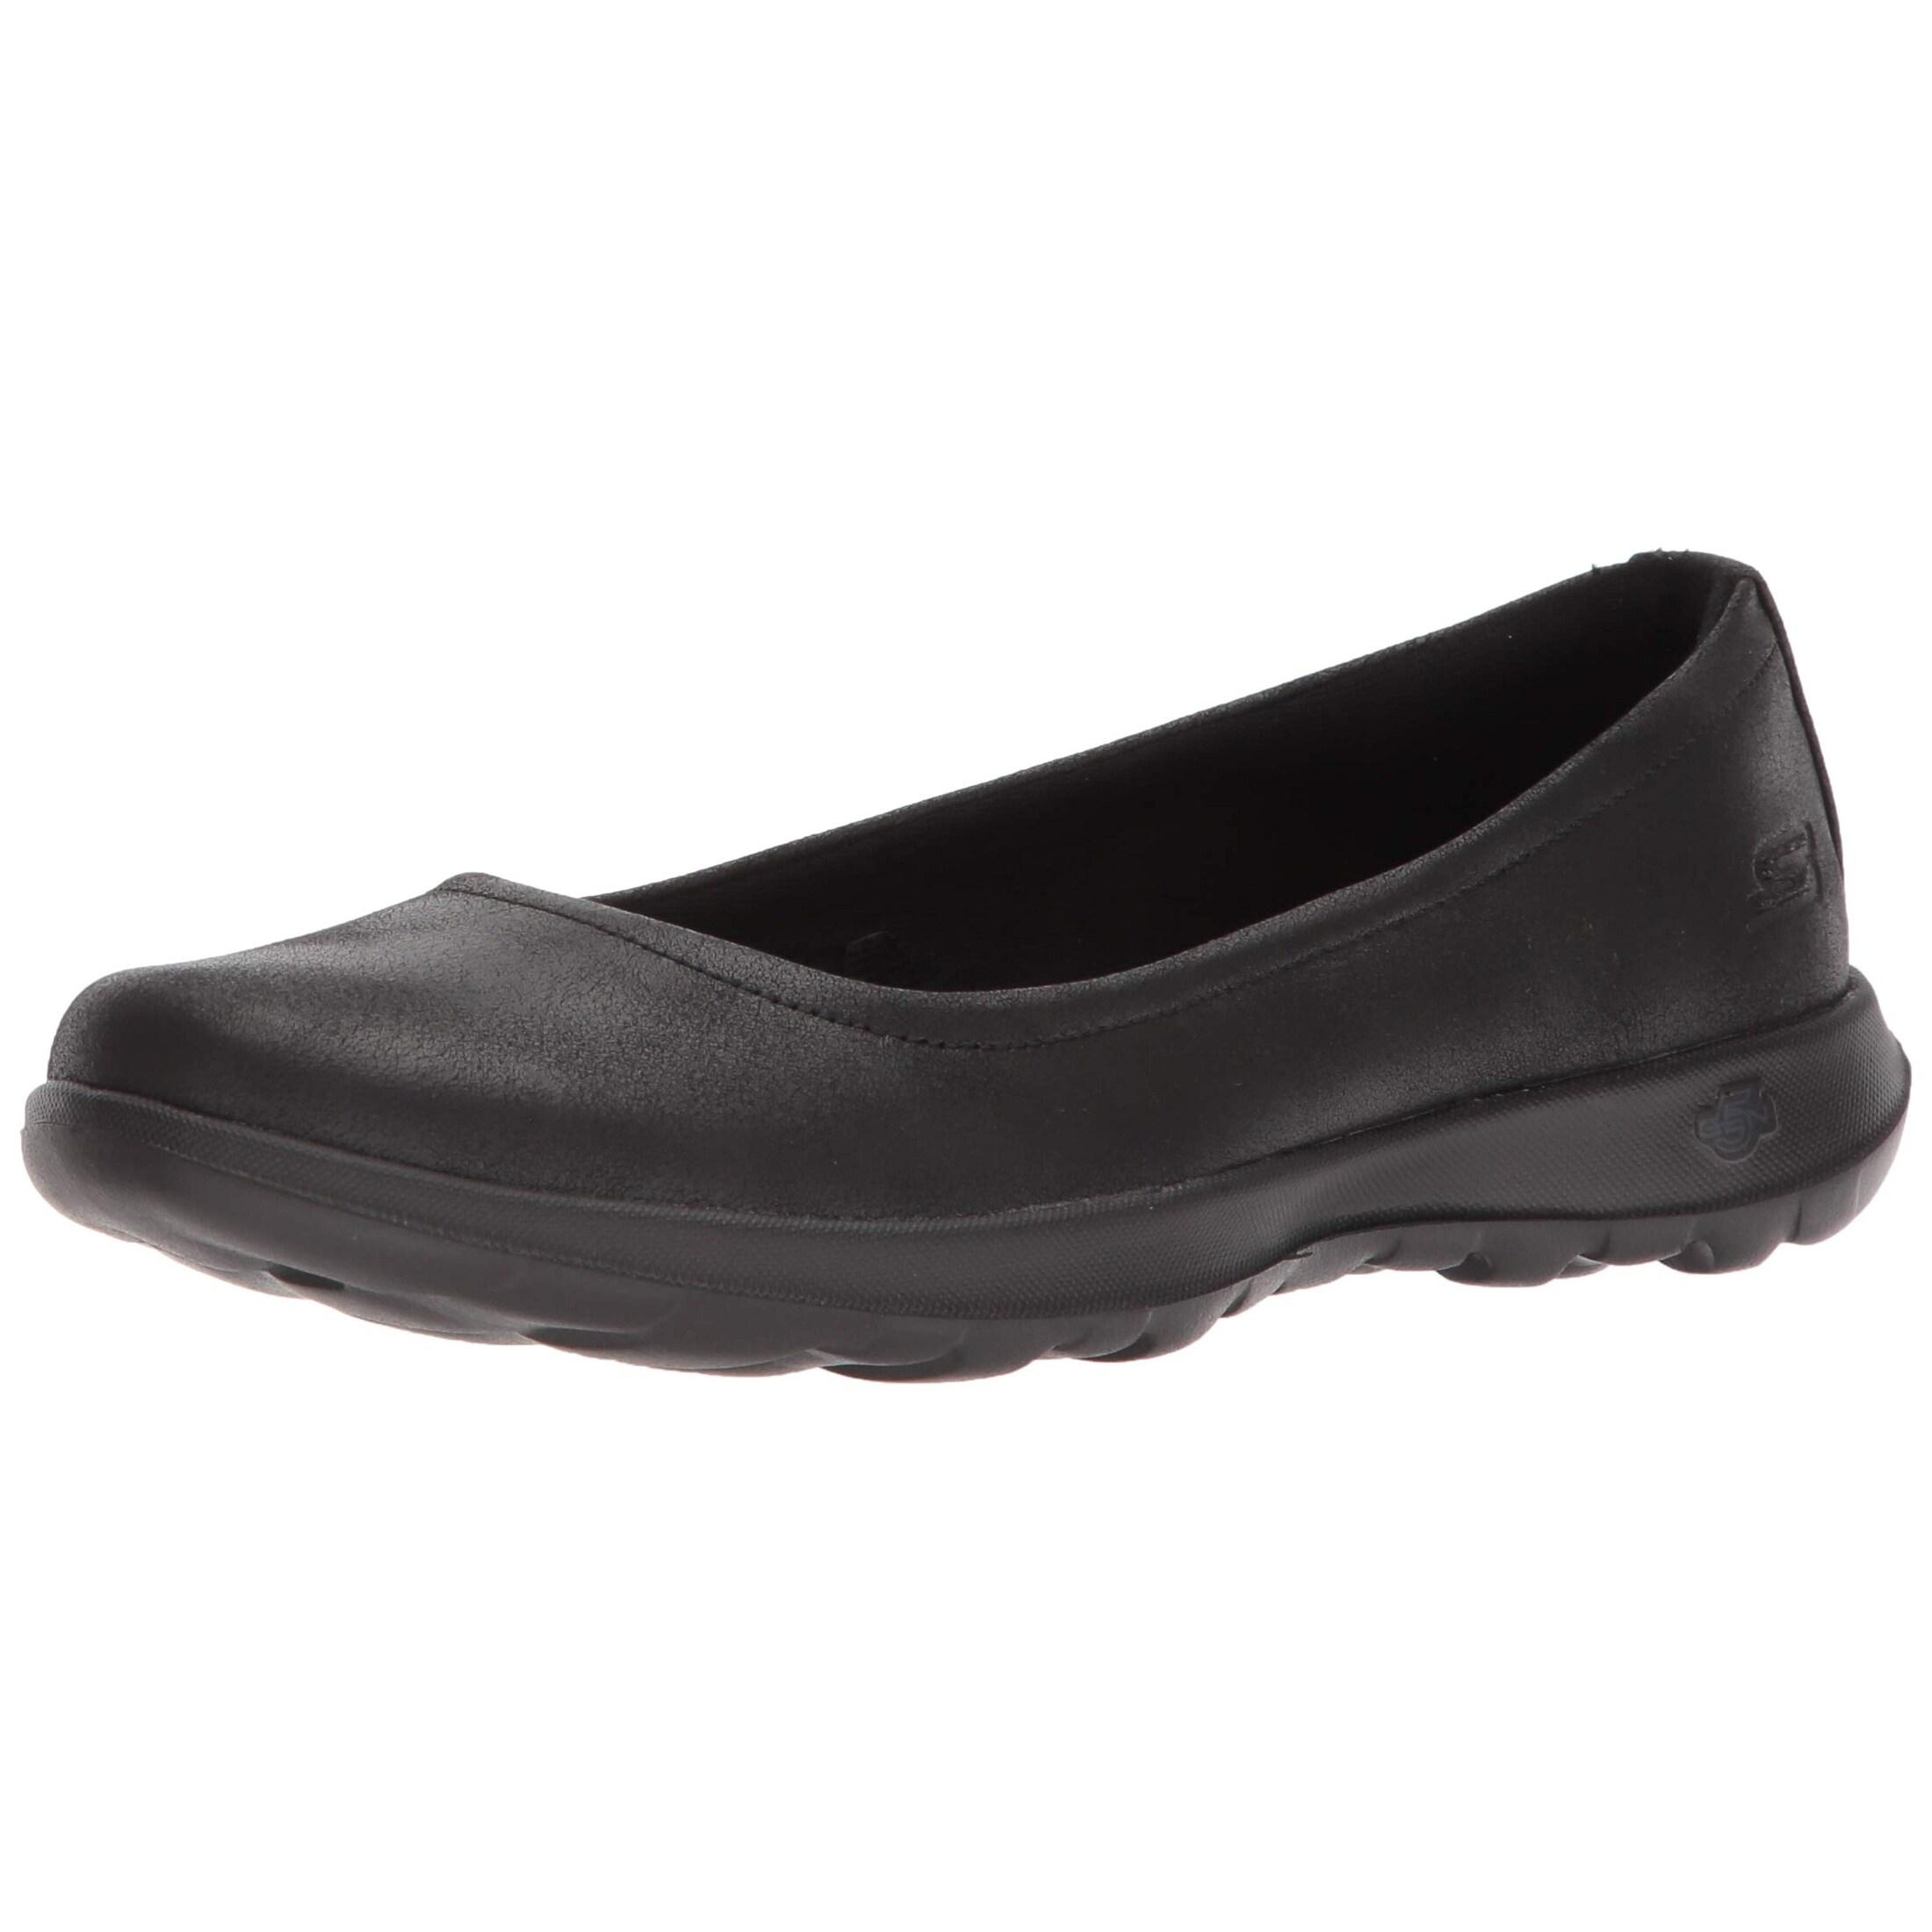 Skechers Go Walk Lite 15395 Ballet Flat